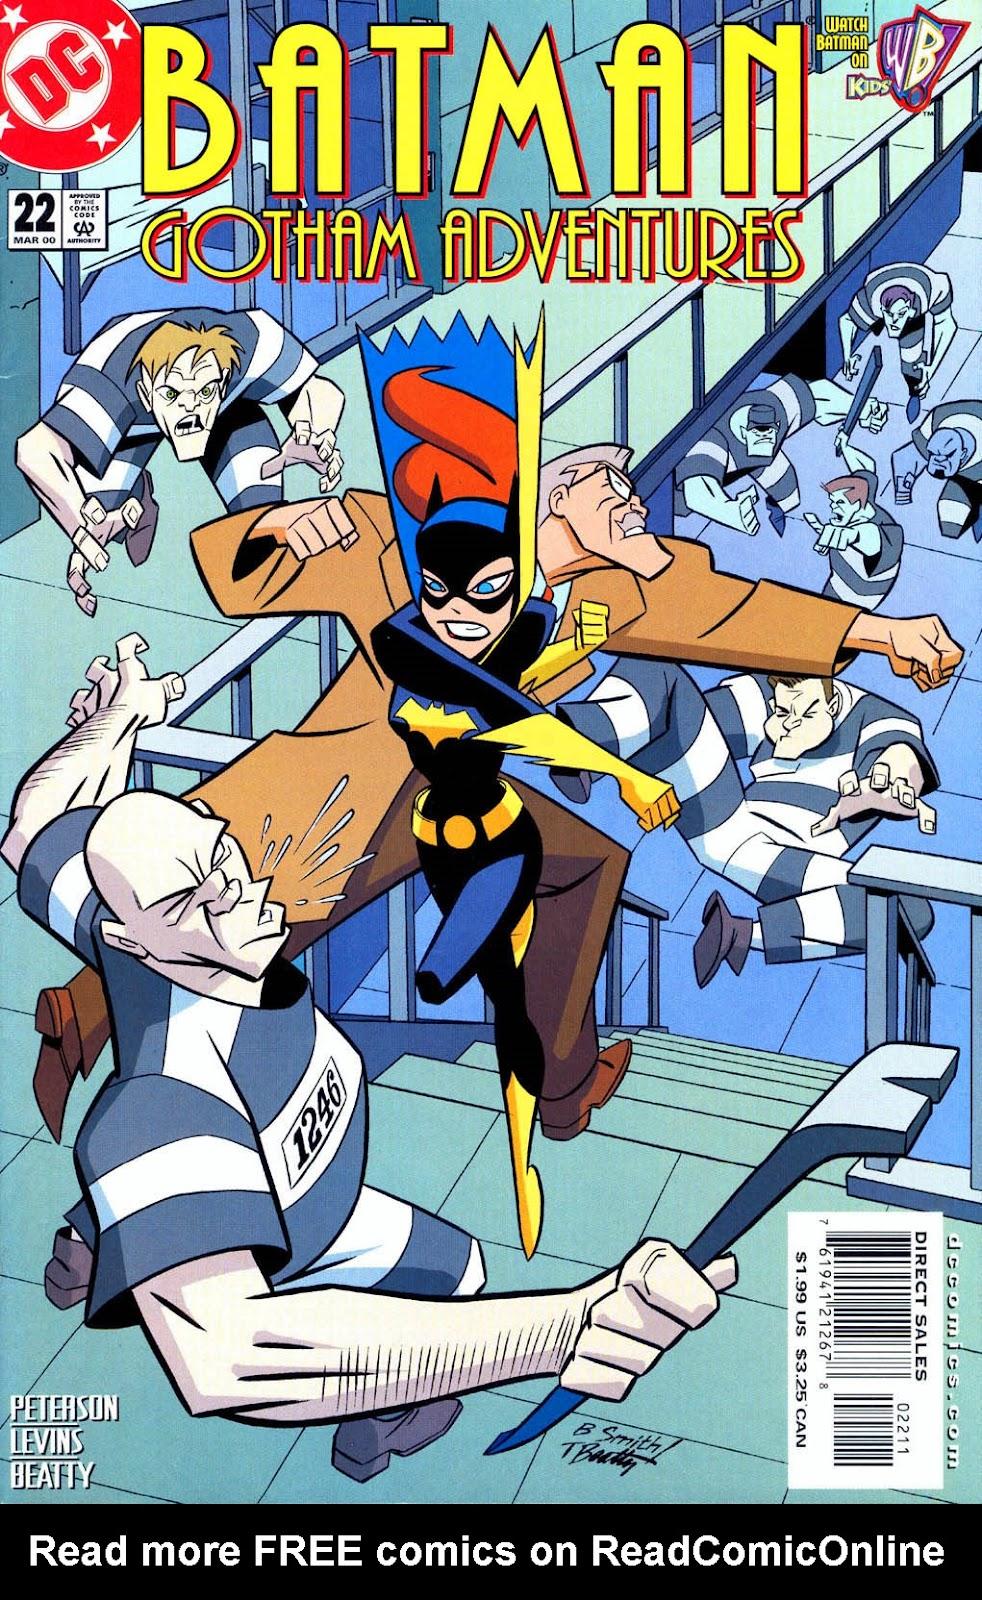 batman gotham adventures issue 22 viewcomic reading. Black Bedroom Furniture Sets. Home Design Ideas